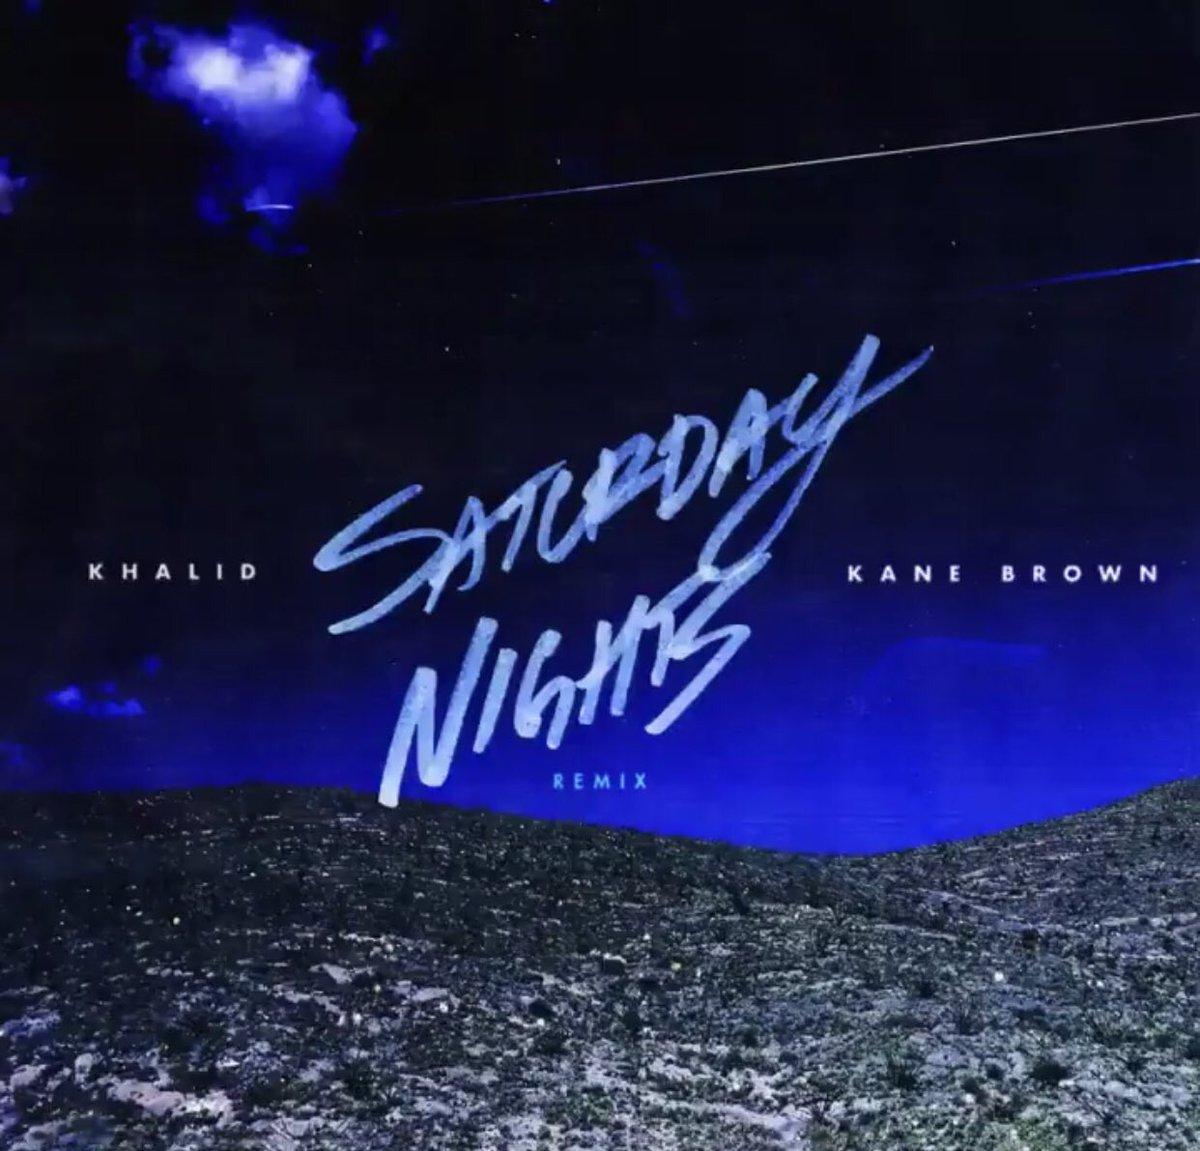 me listening to the saturday nights remix @thegreatkhalid @kanebrown